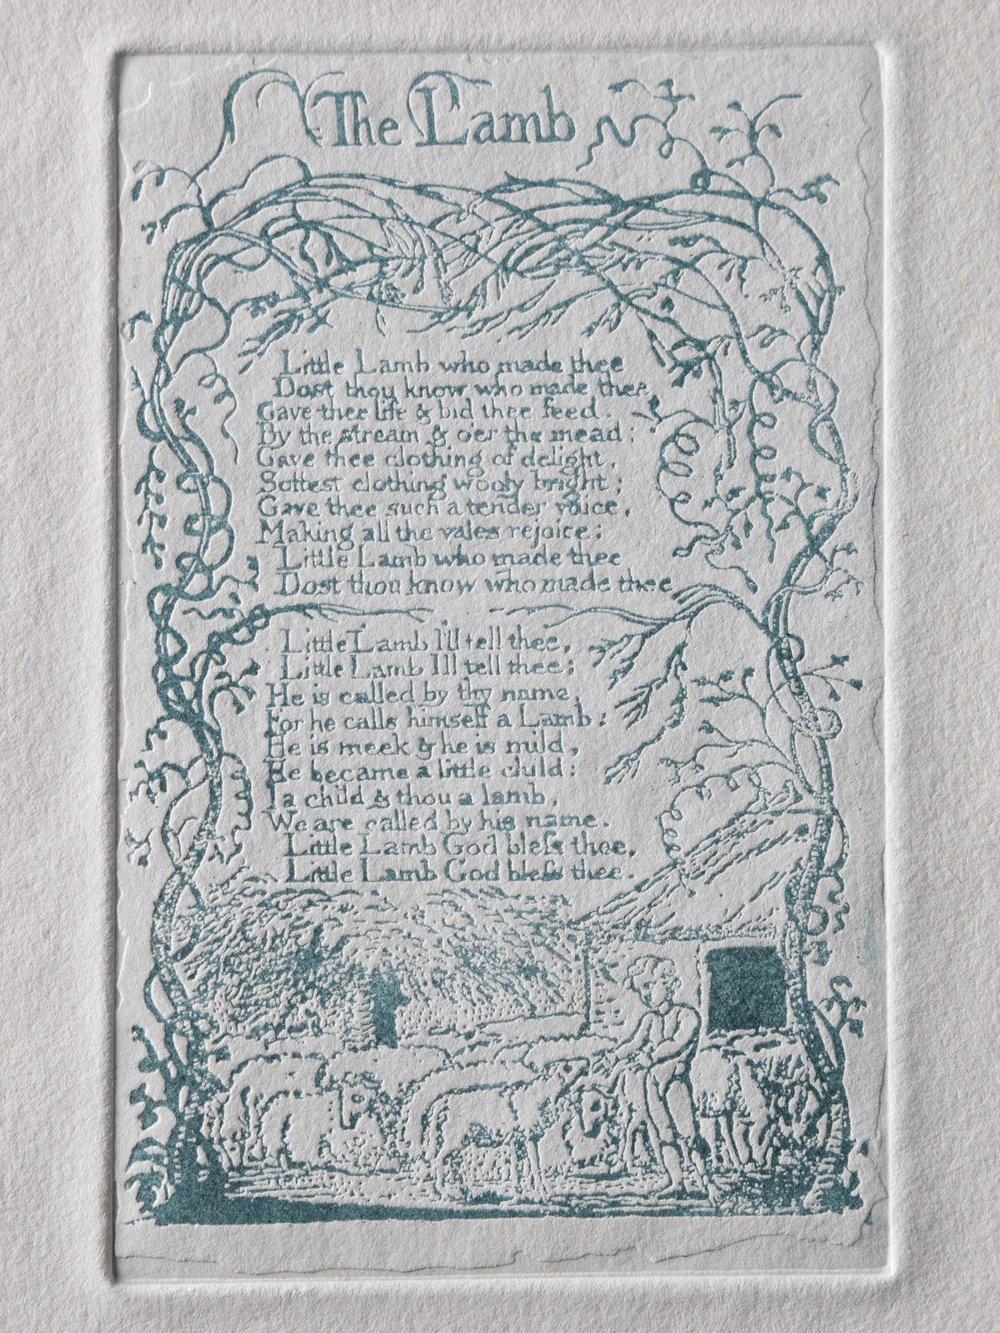 William-Blake-prints-The-Lamb.jpg